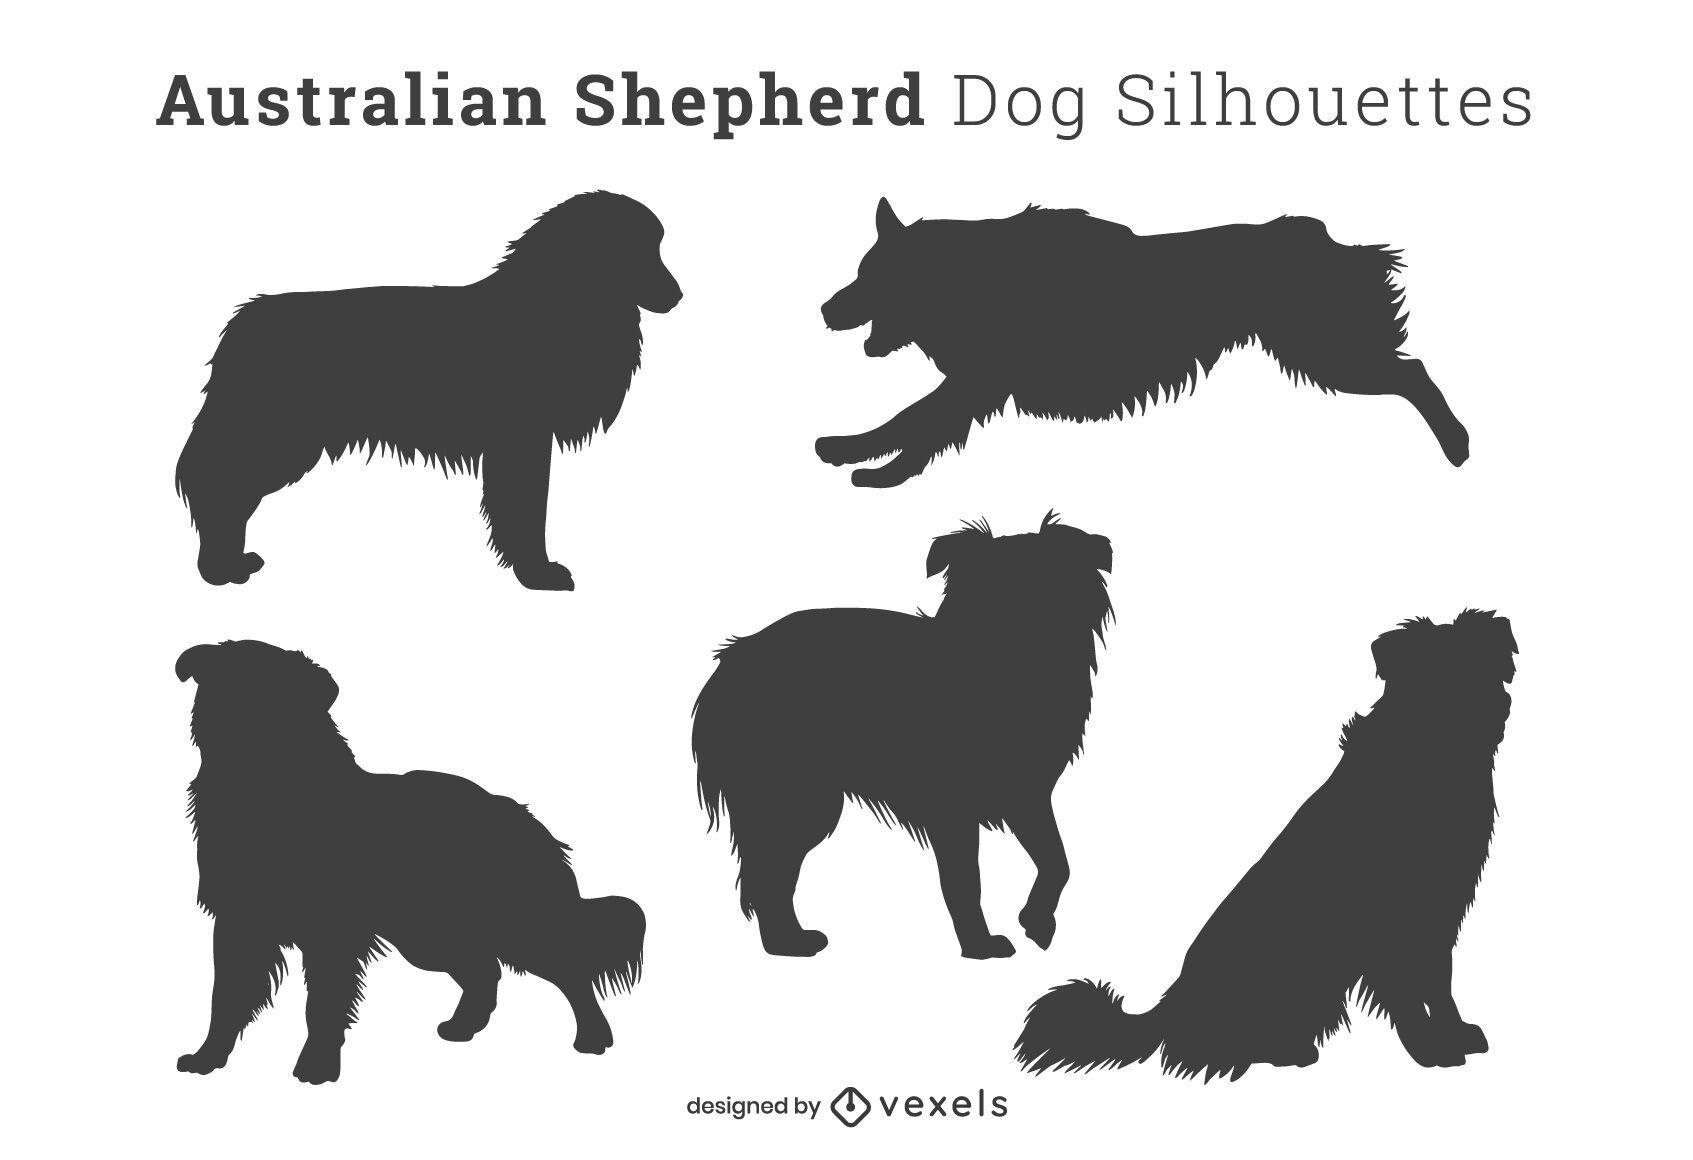 Australian Shepherd Dog Silhouettes